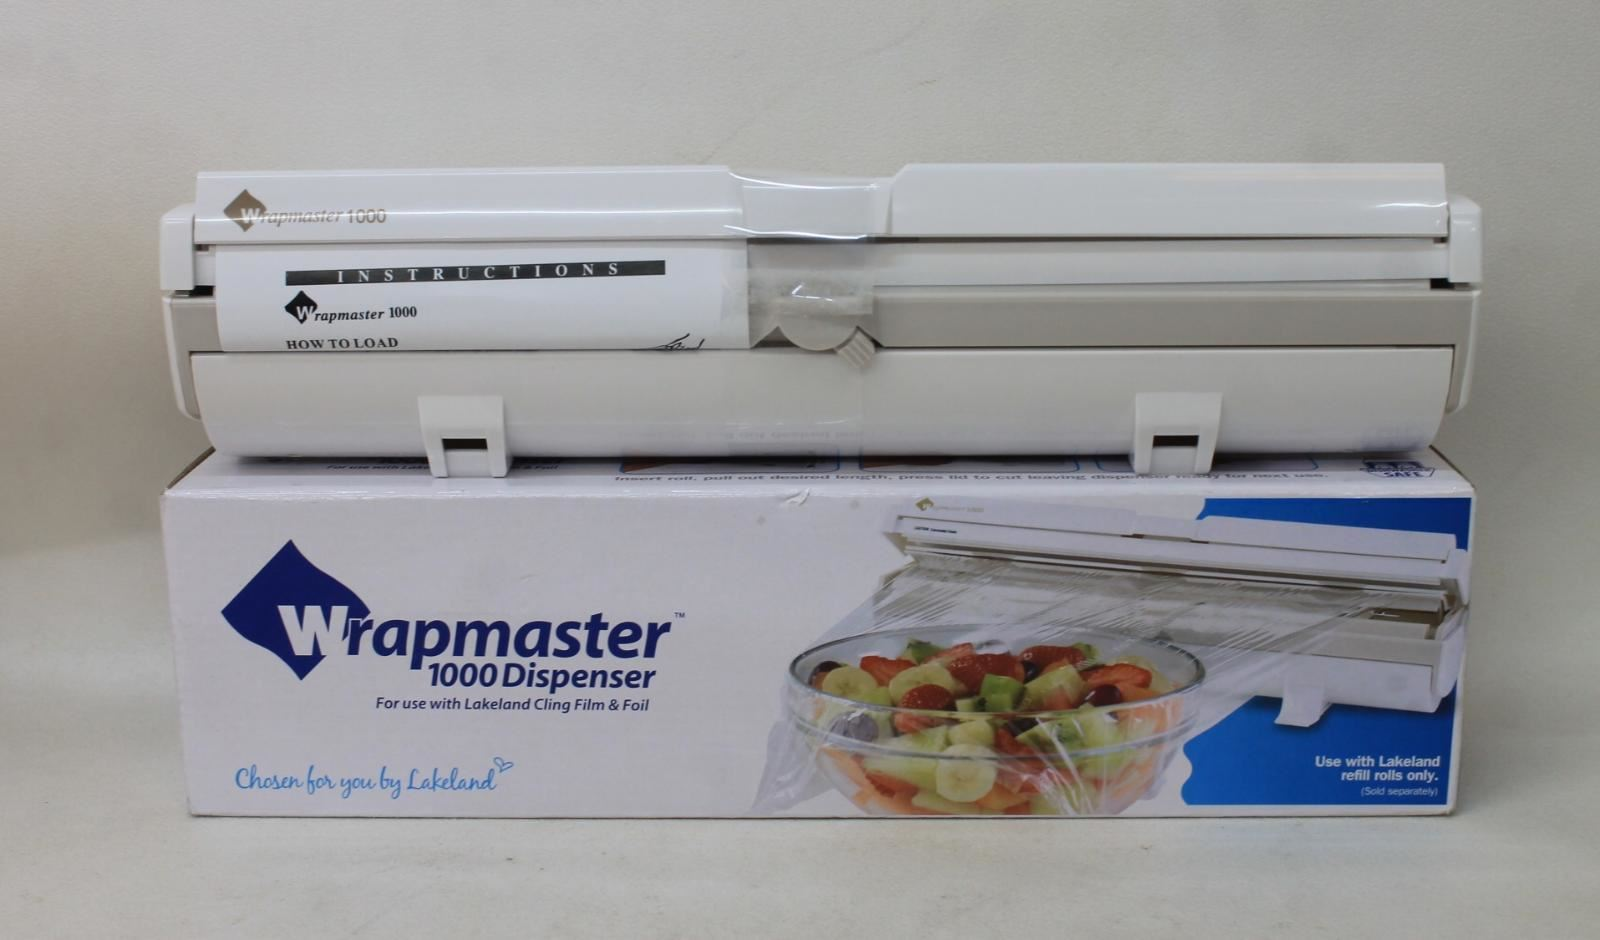 WRAPMASTER-1000-Portable-amp-Compact-Dispenser-For-Lakeland-Cling-Film-amp-Foil-NEW